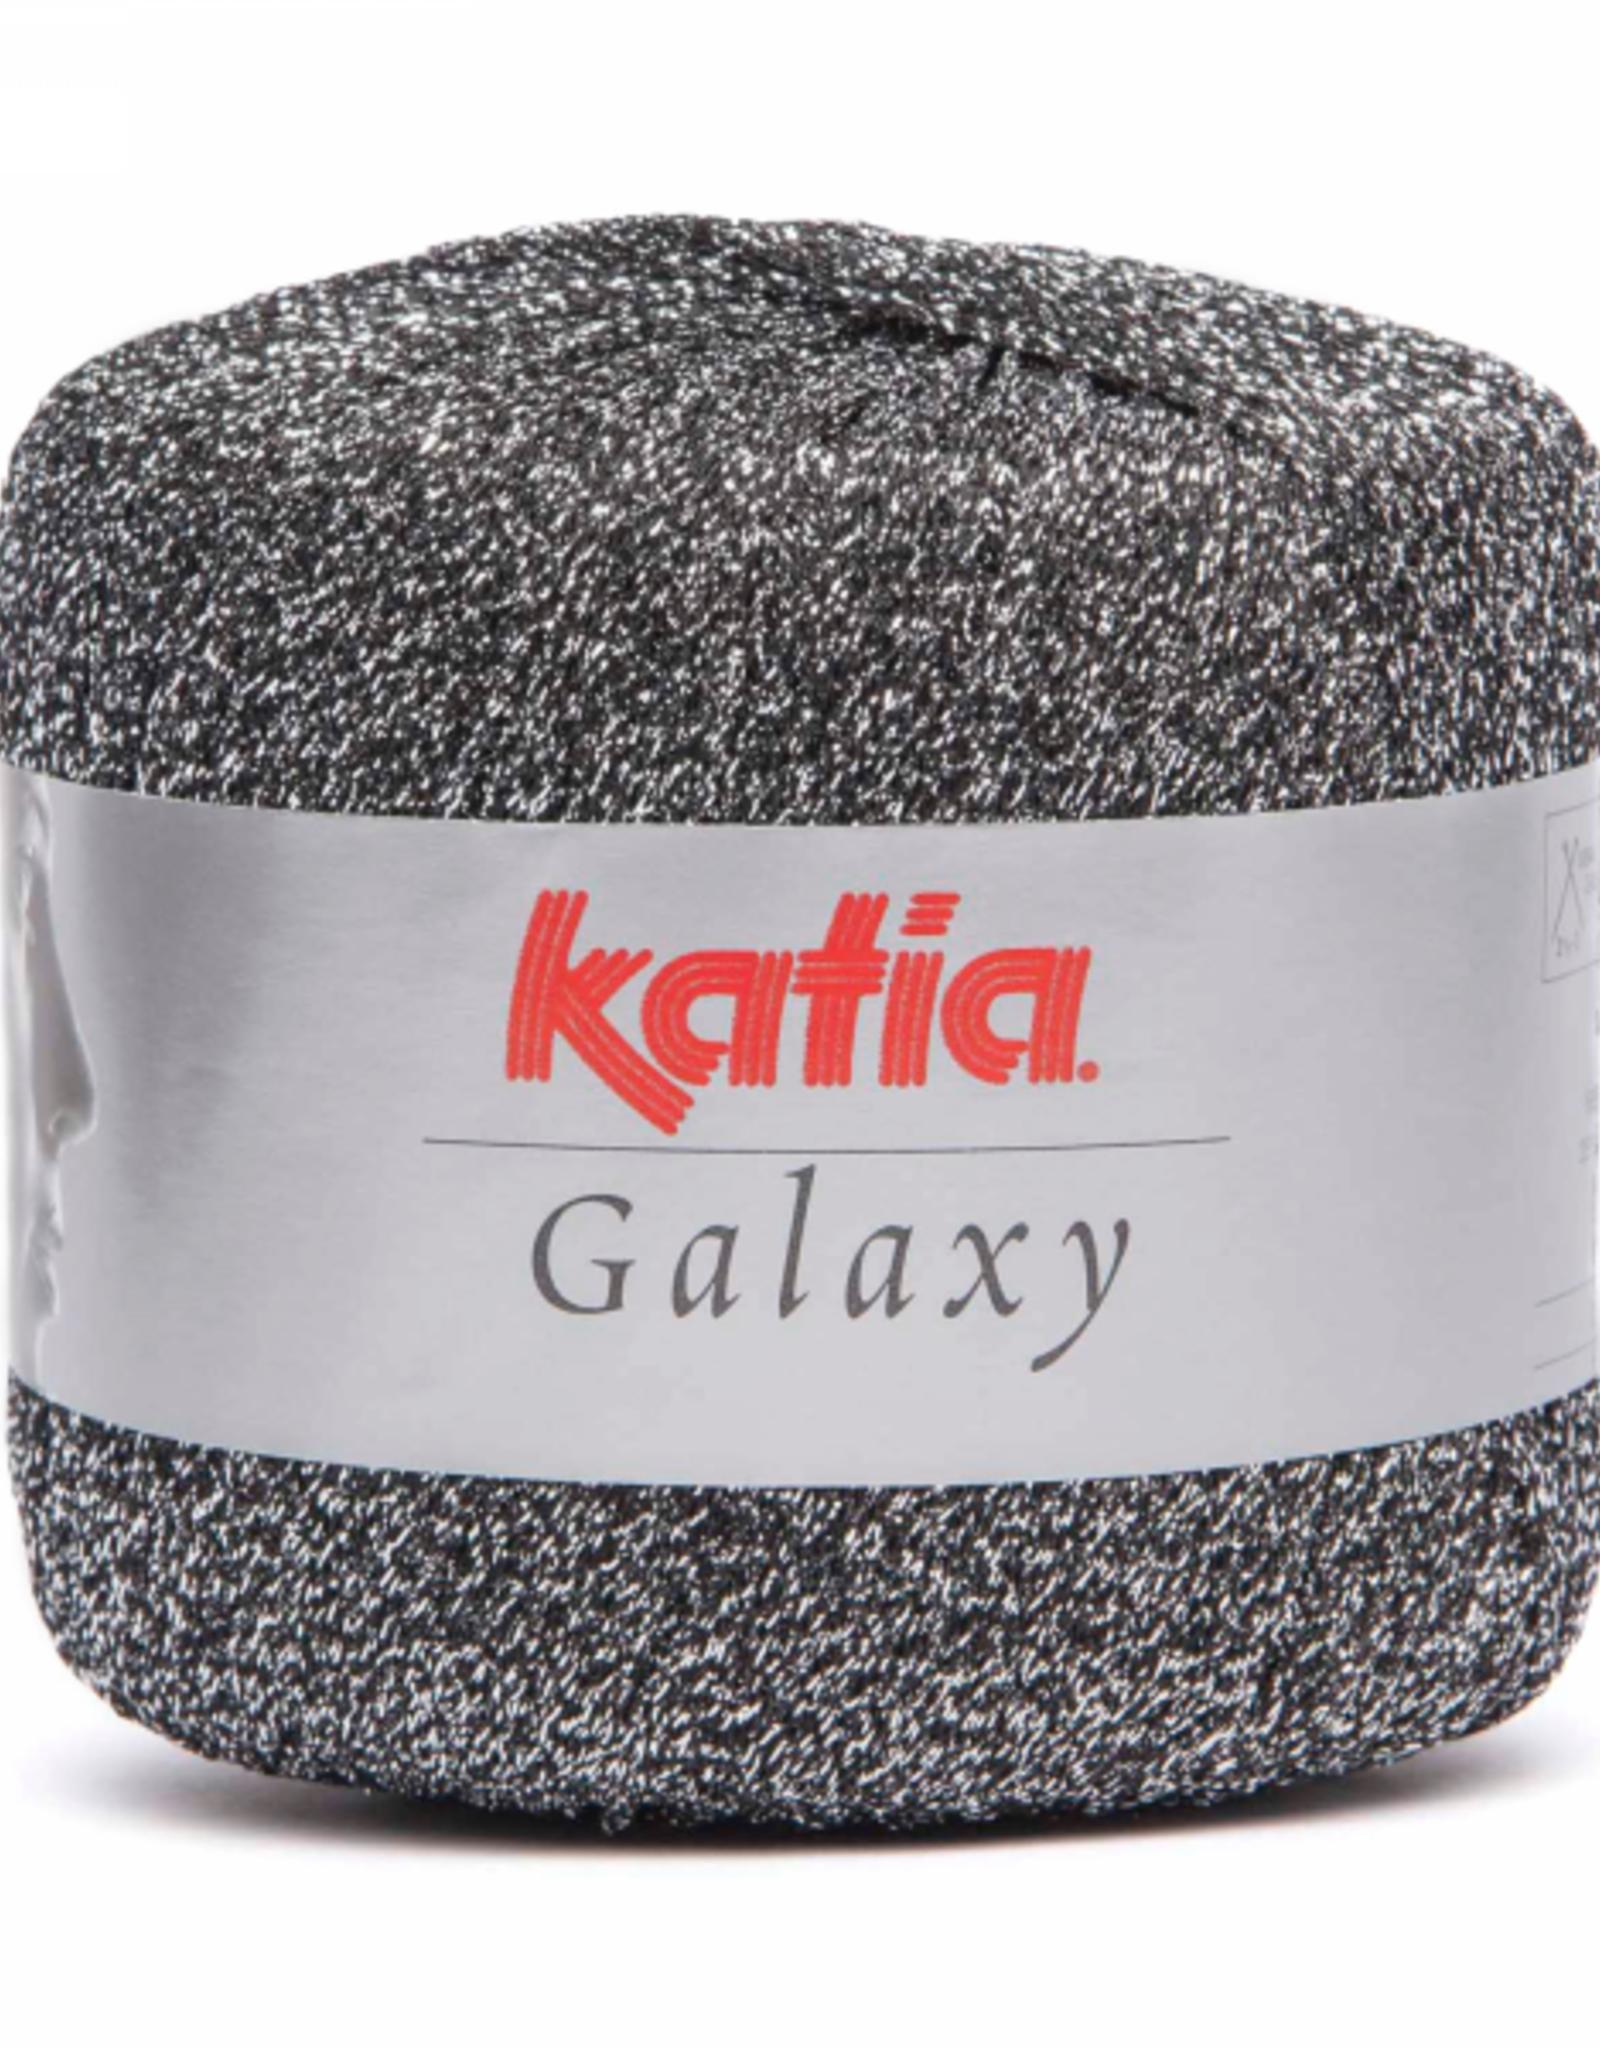 Katia Katia Galaxy 13 zilver met zwart